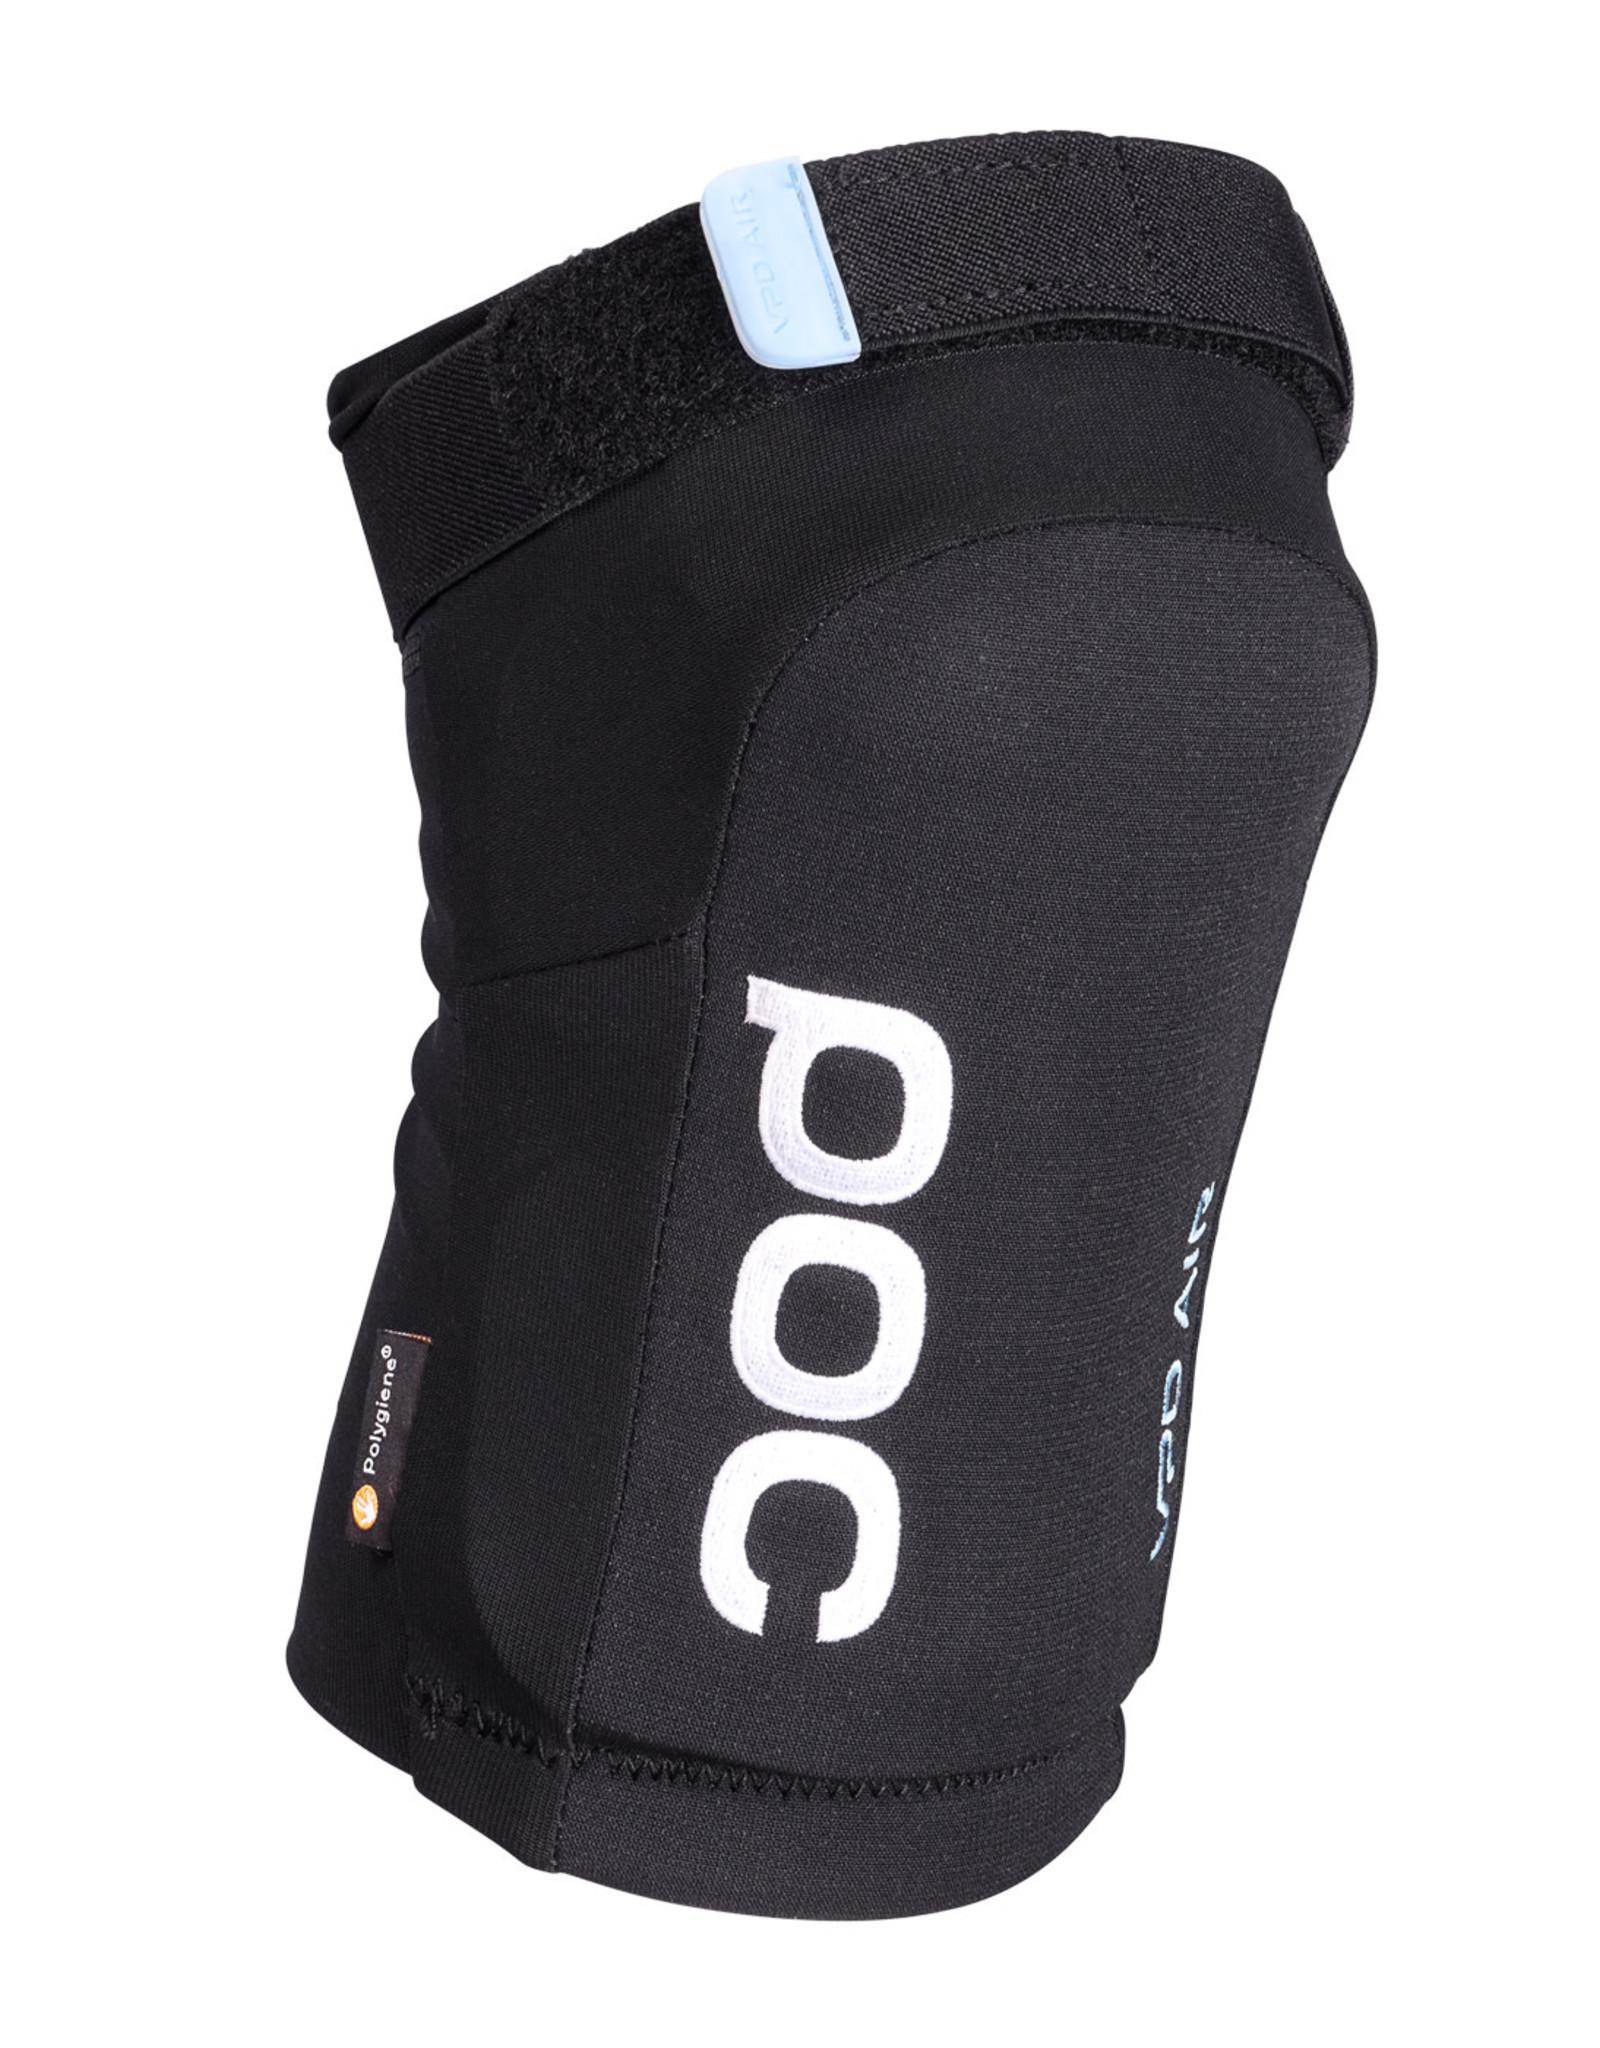 POC Poc Protège-Genoux Joint VPD Air